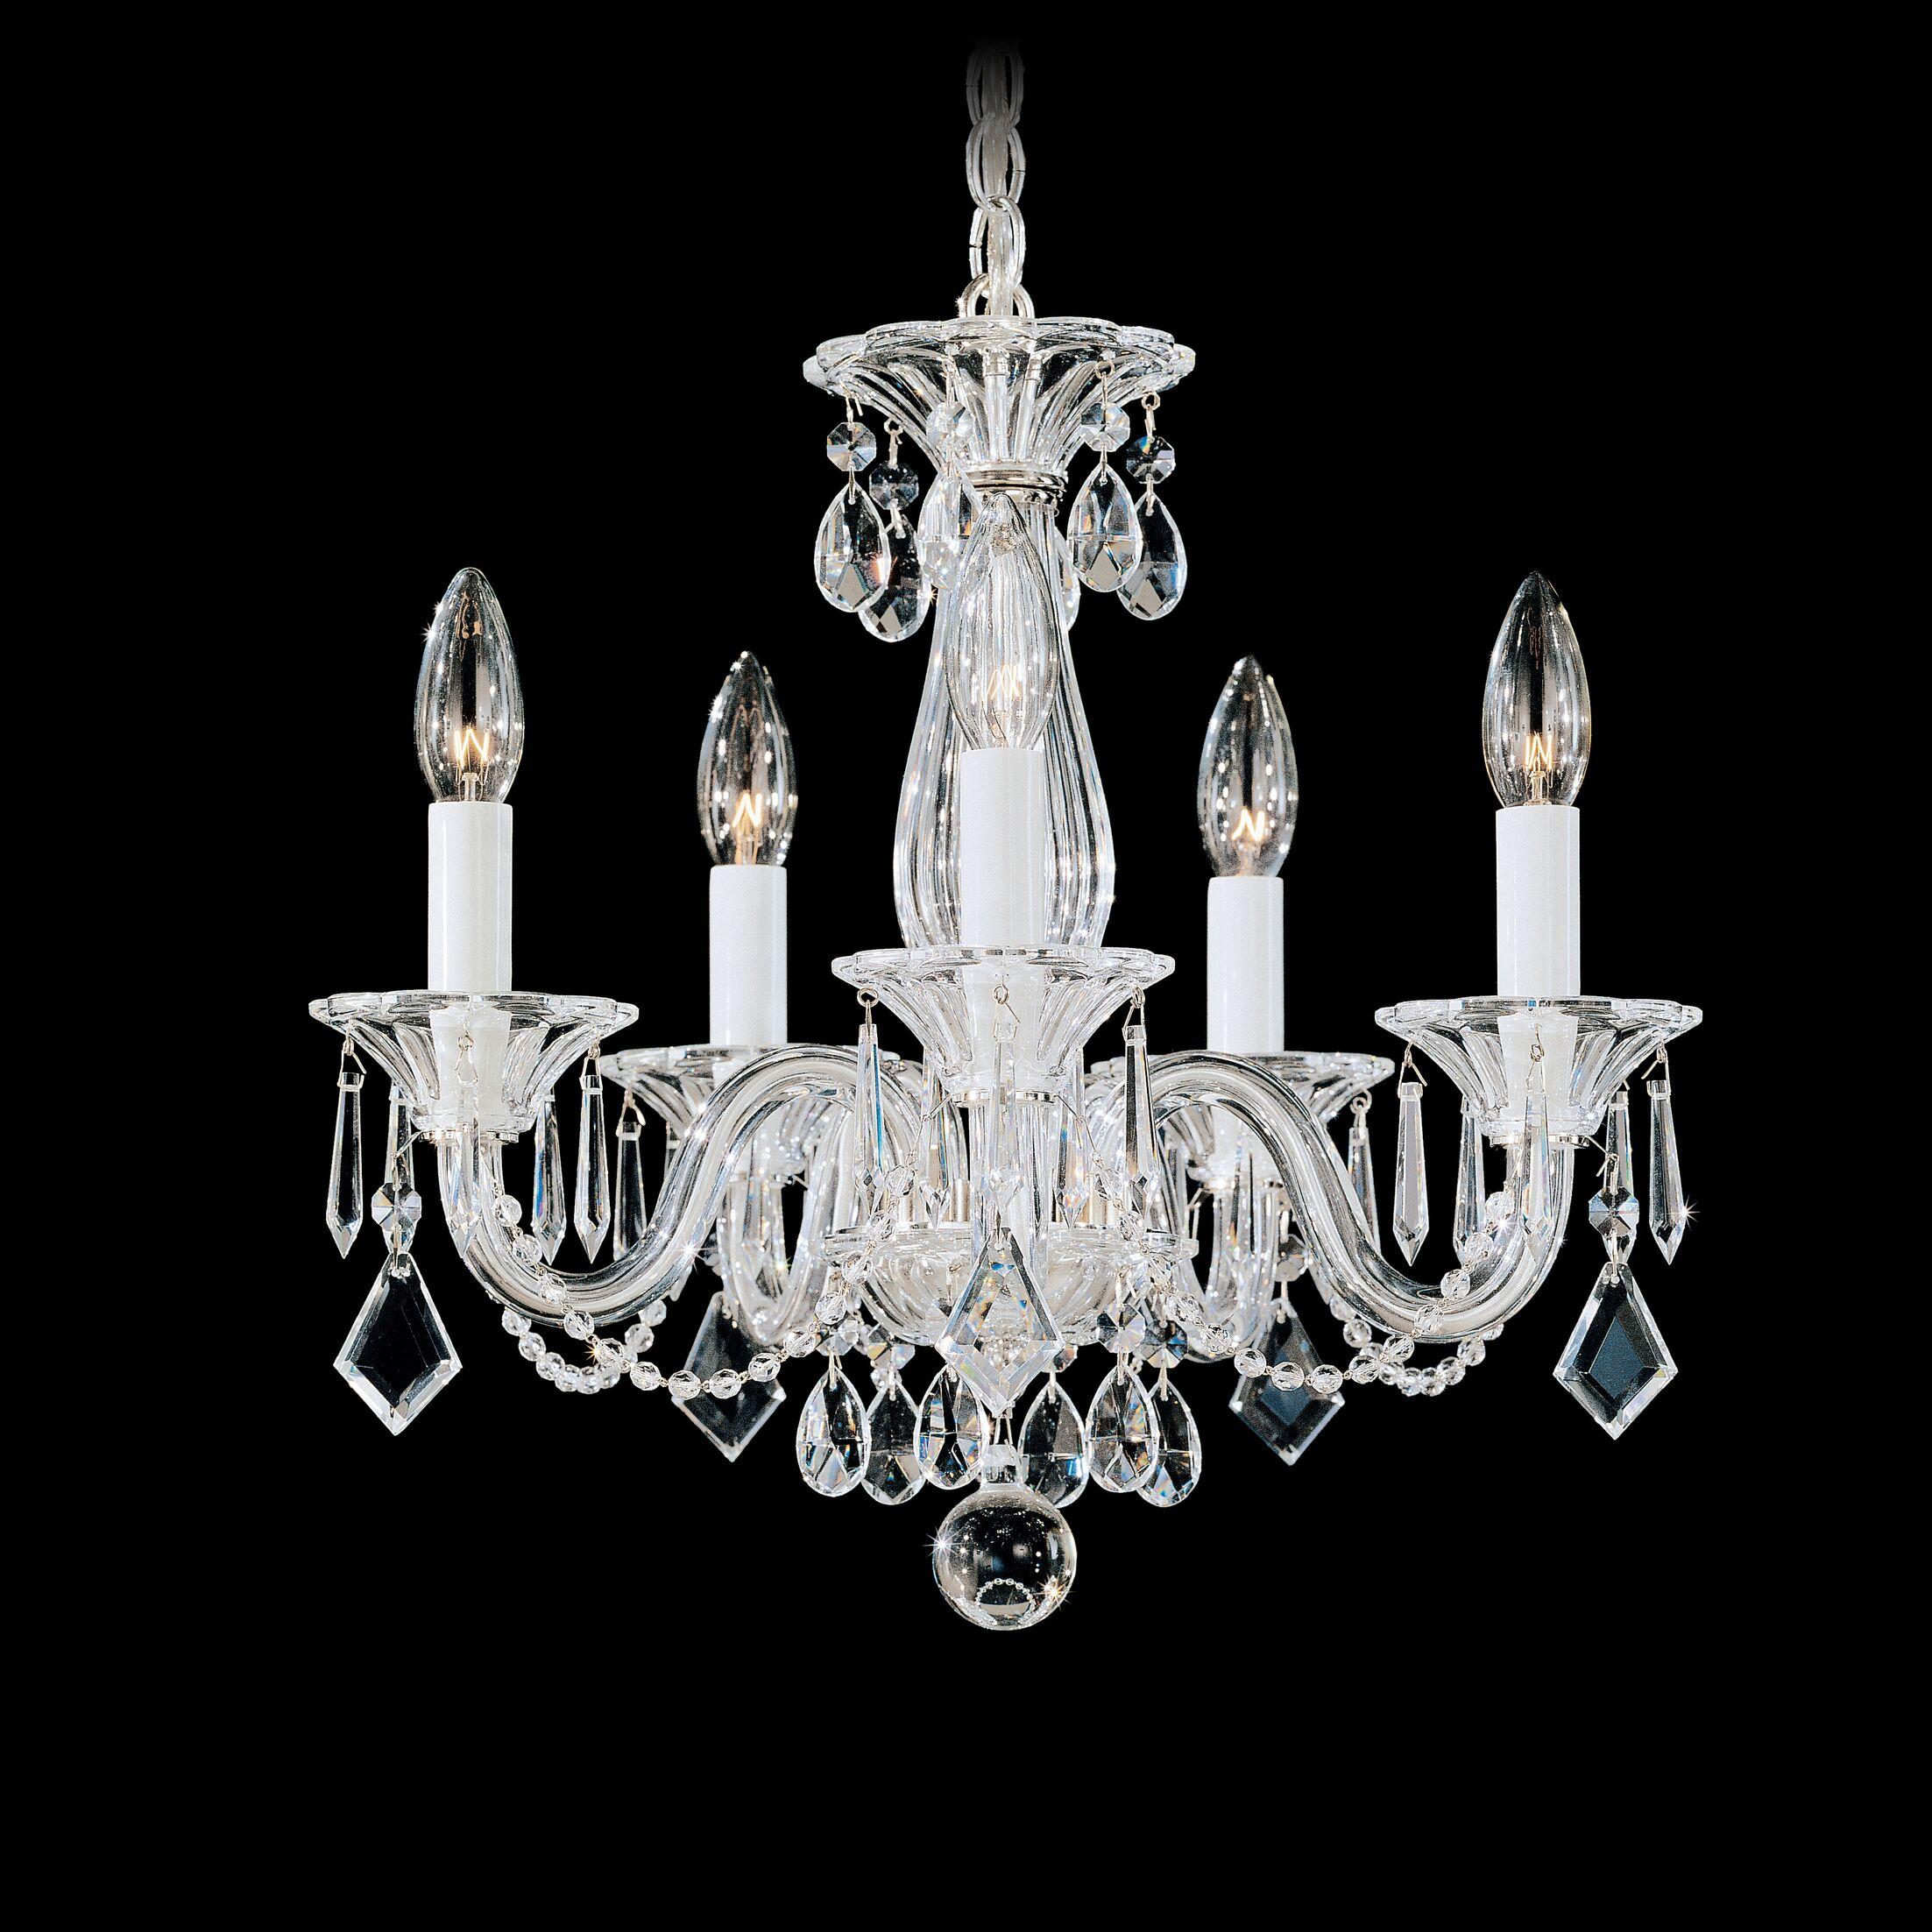 Allegro 5-Light Chandelier Crystal Color: Clear